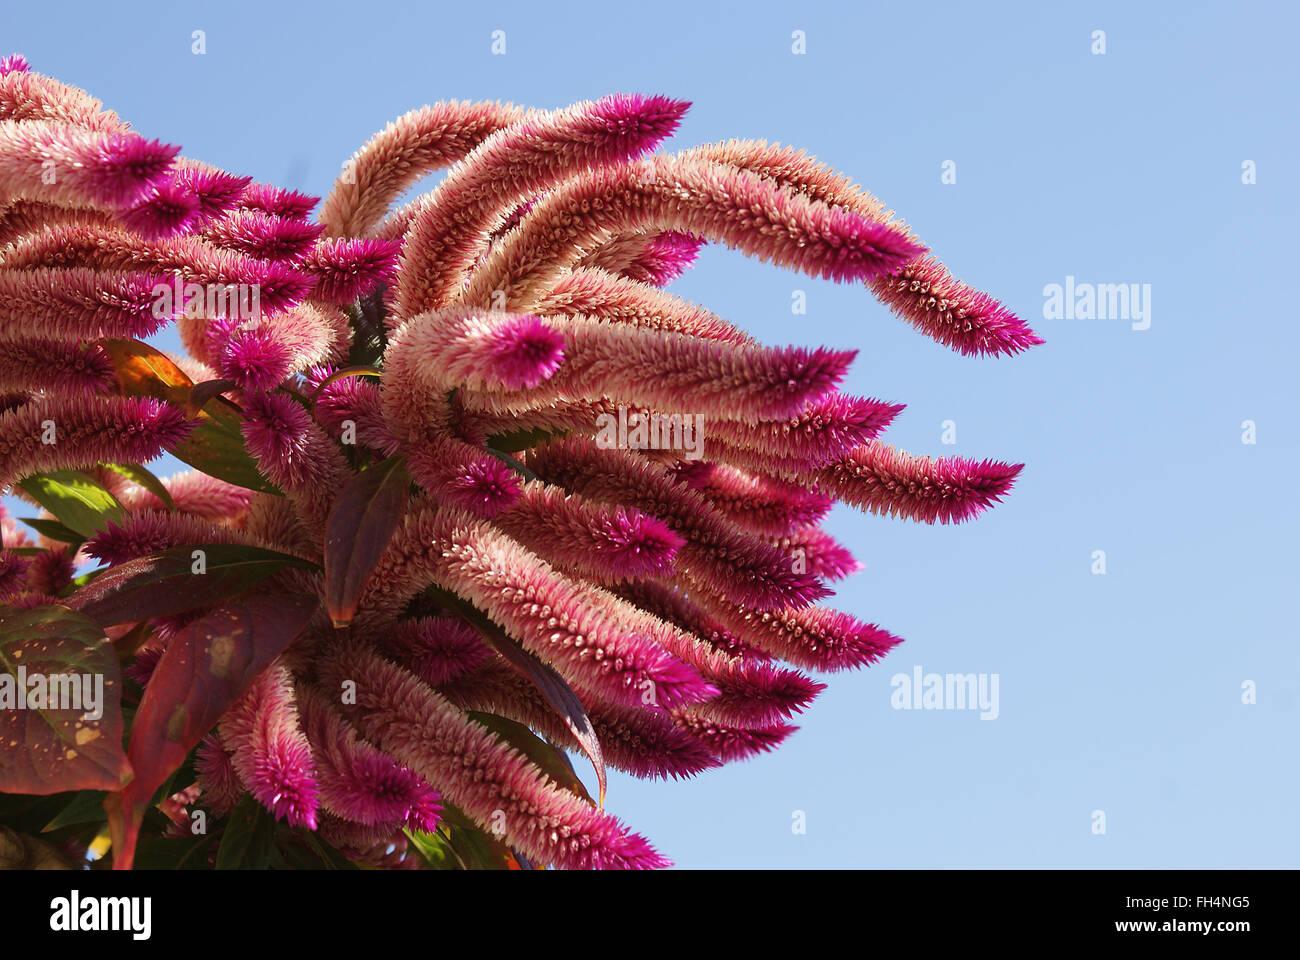 Magenta flower - Stock Image